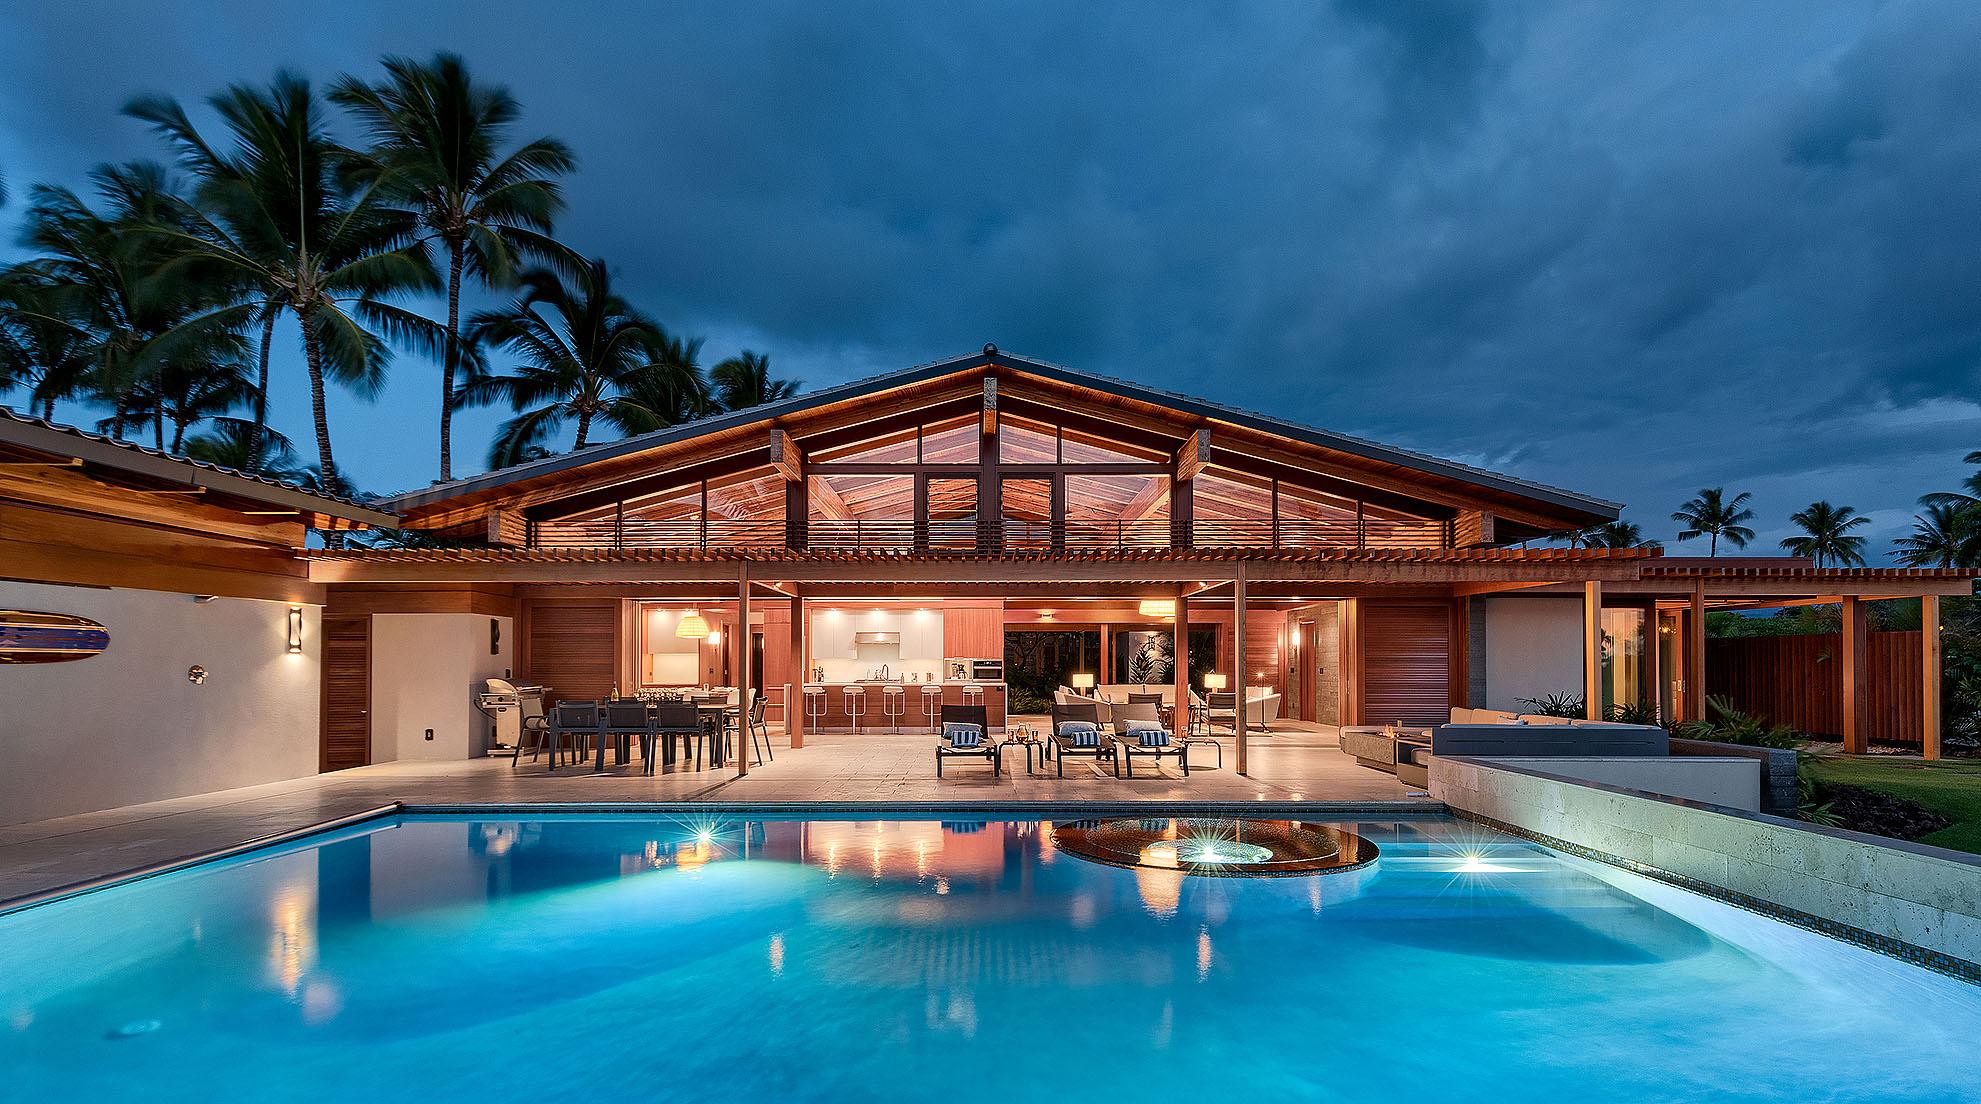 Resort Home Photos by PanaViz